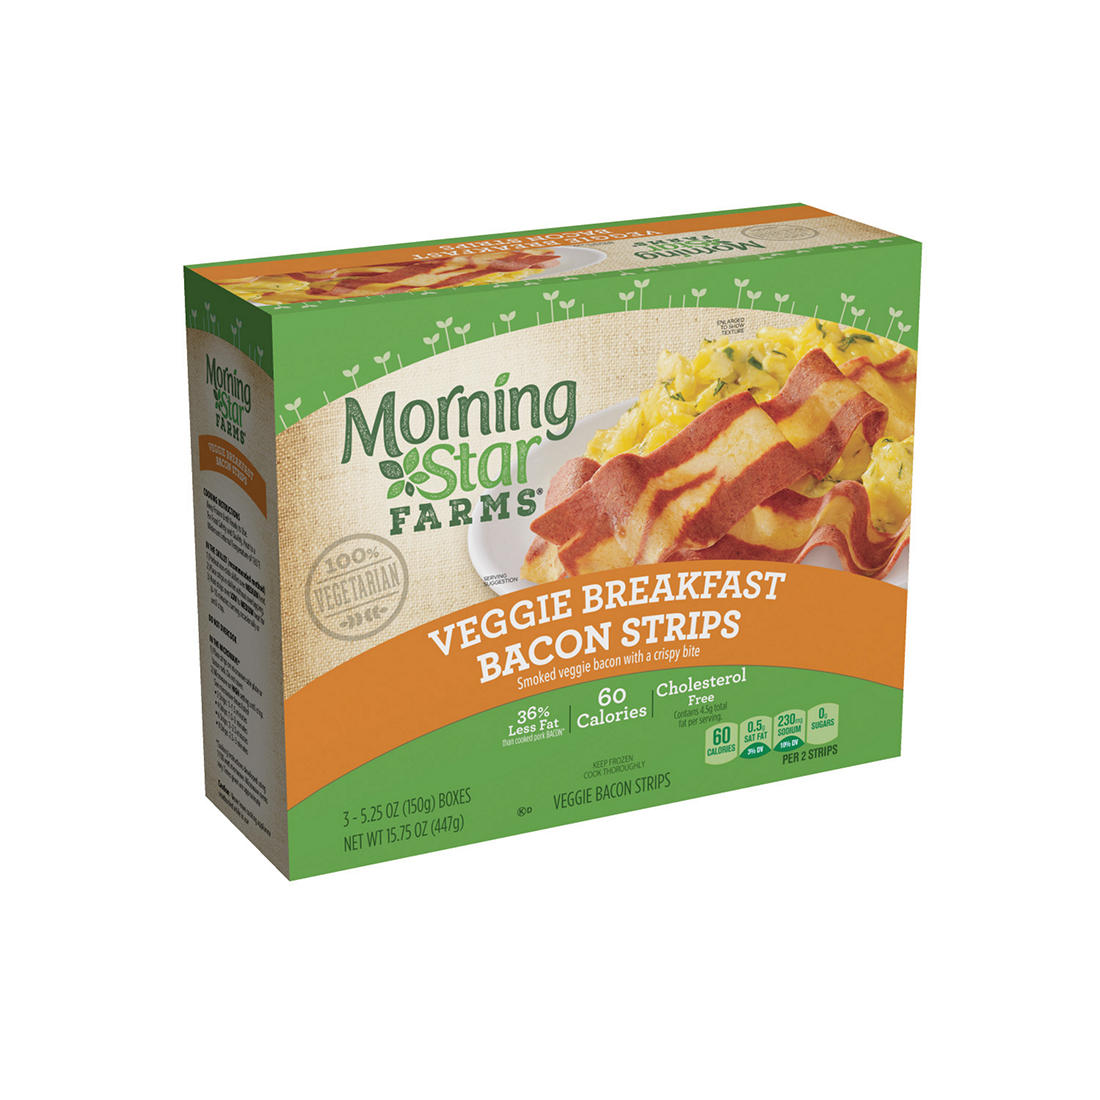 Morningstar Farms Veggie Breakfast Bacon Strips Bjs Wholesale Club